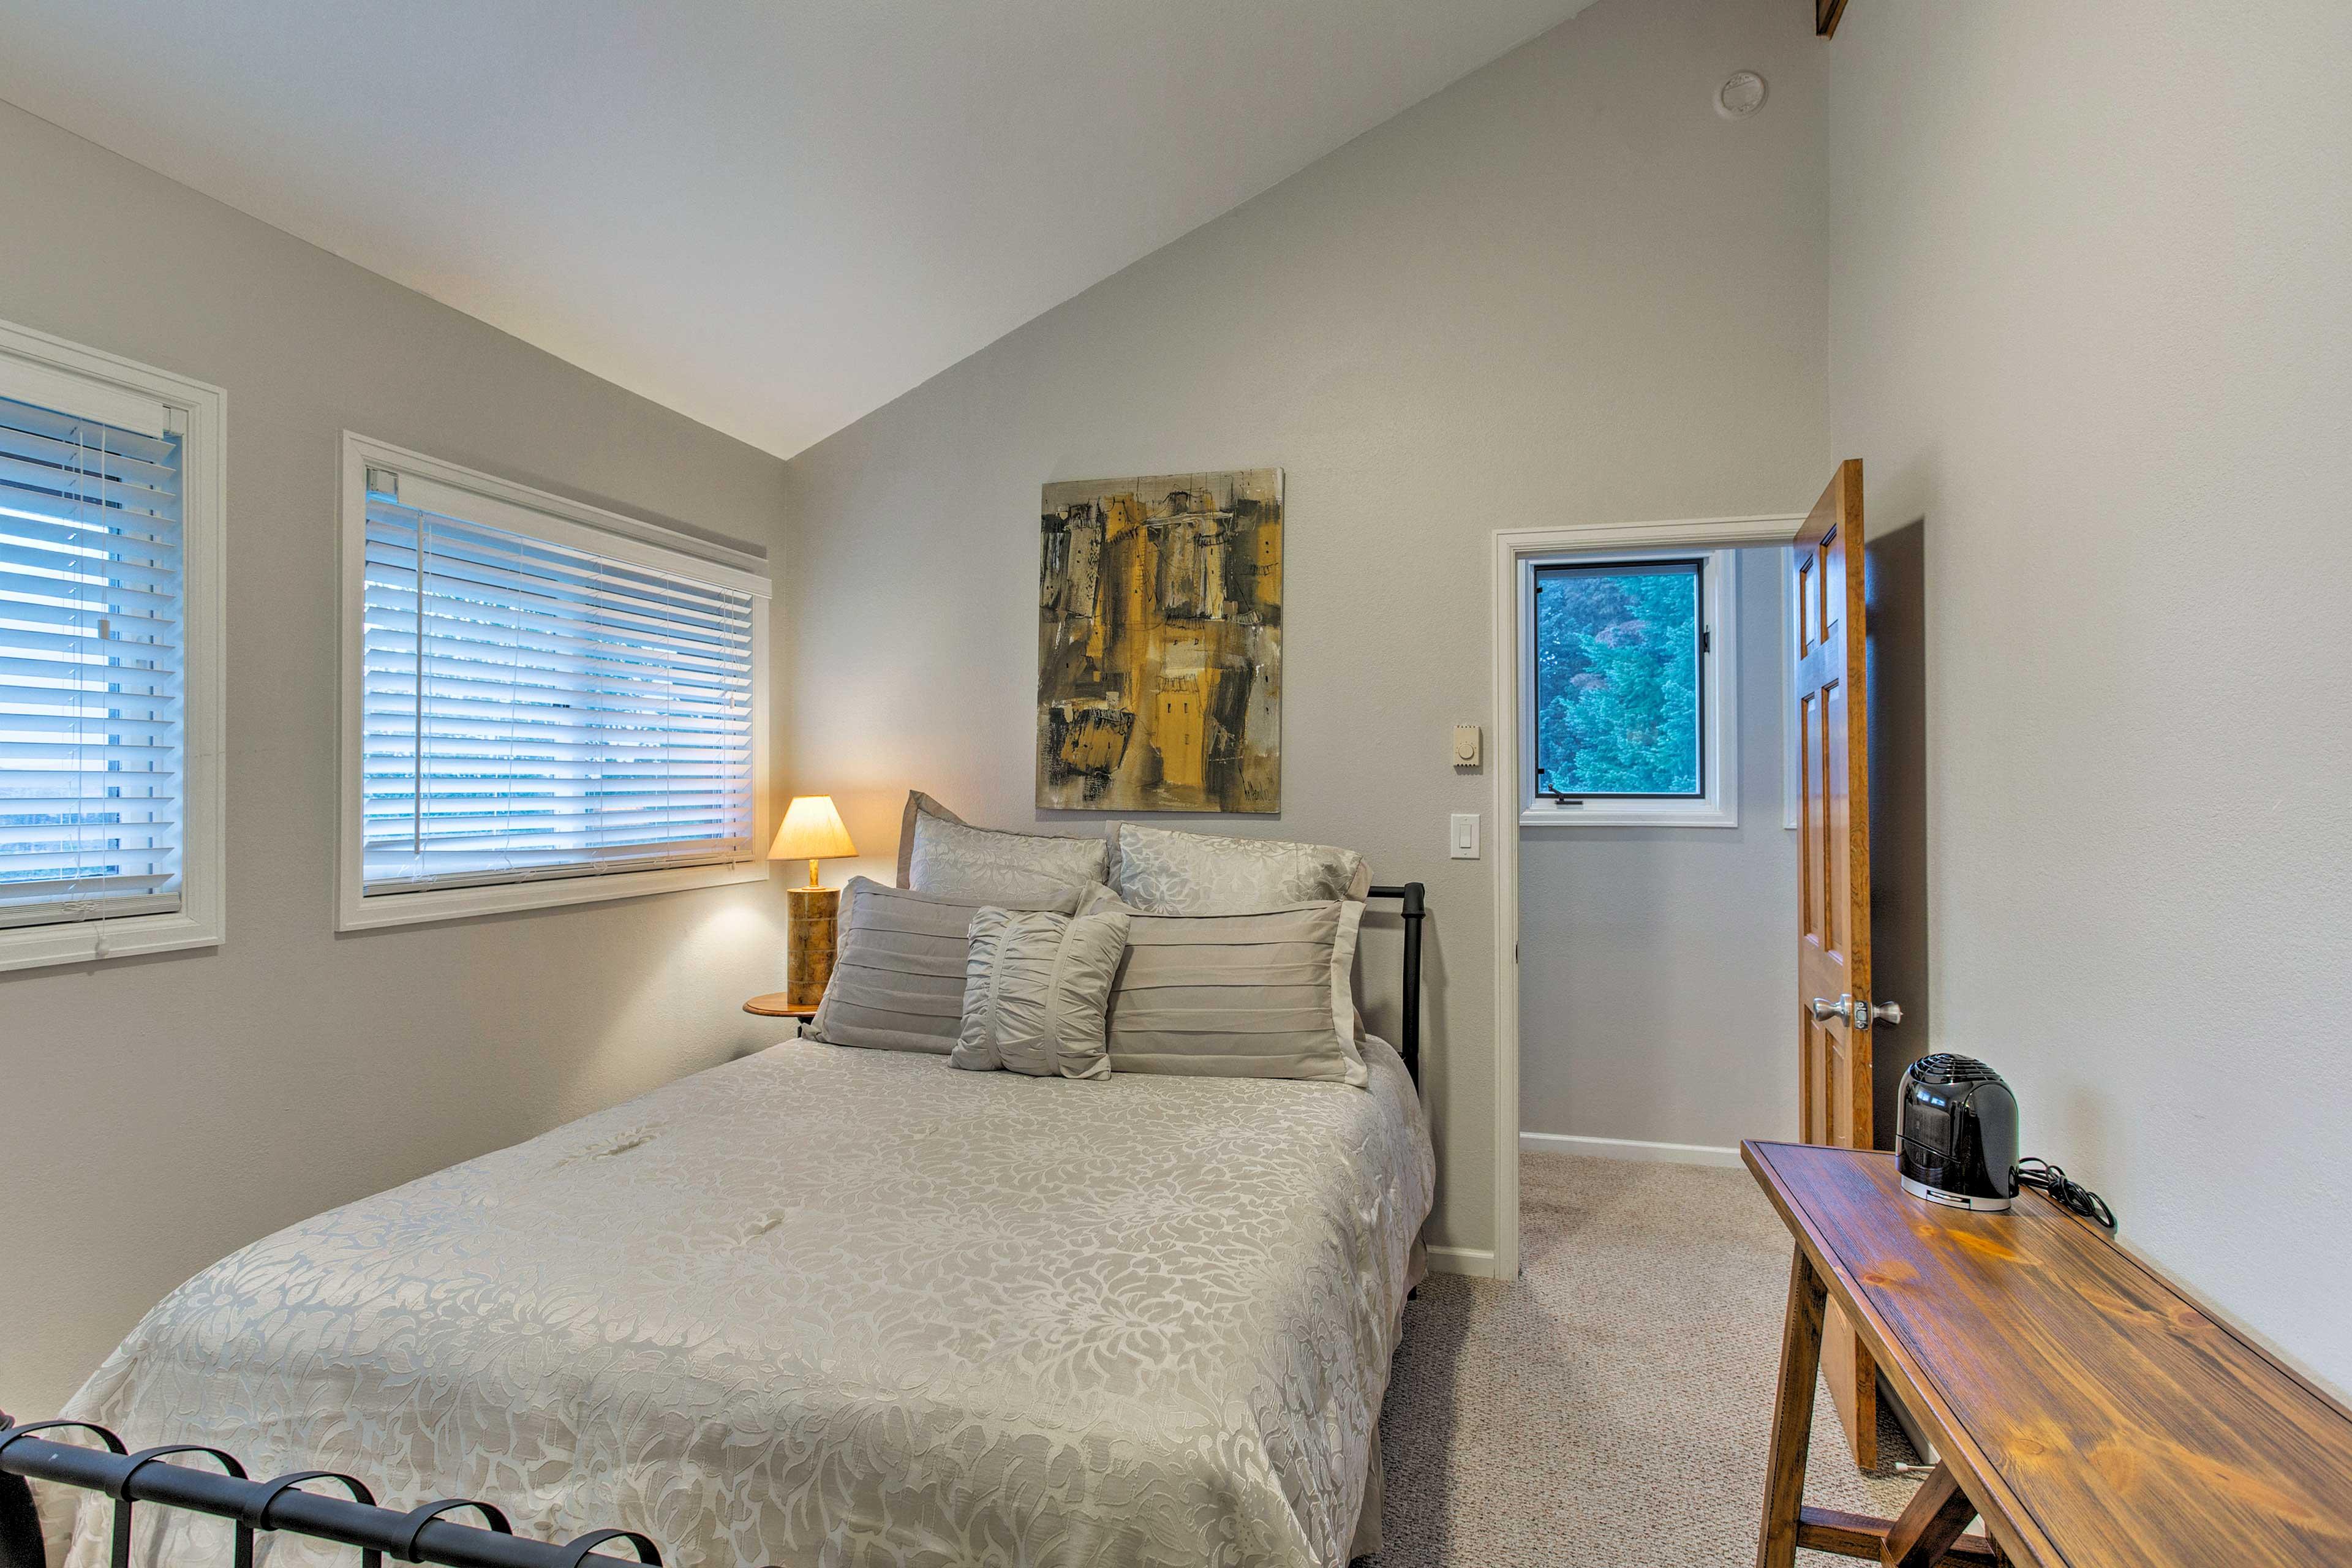 The second bedroom has a comfortable queen mattress.